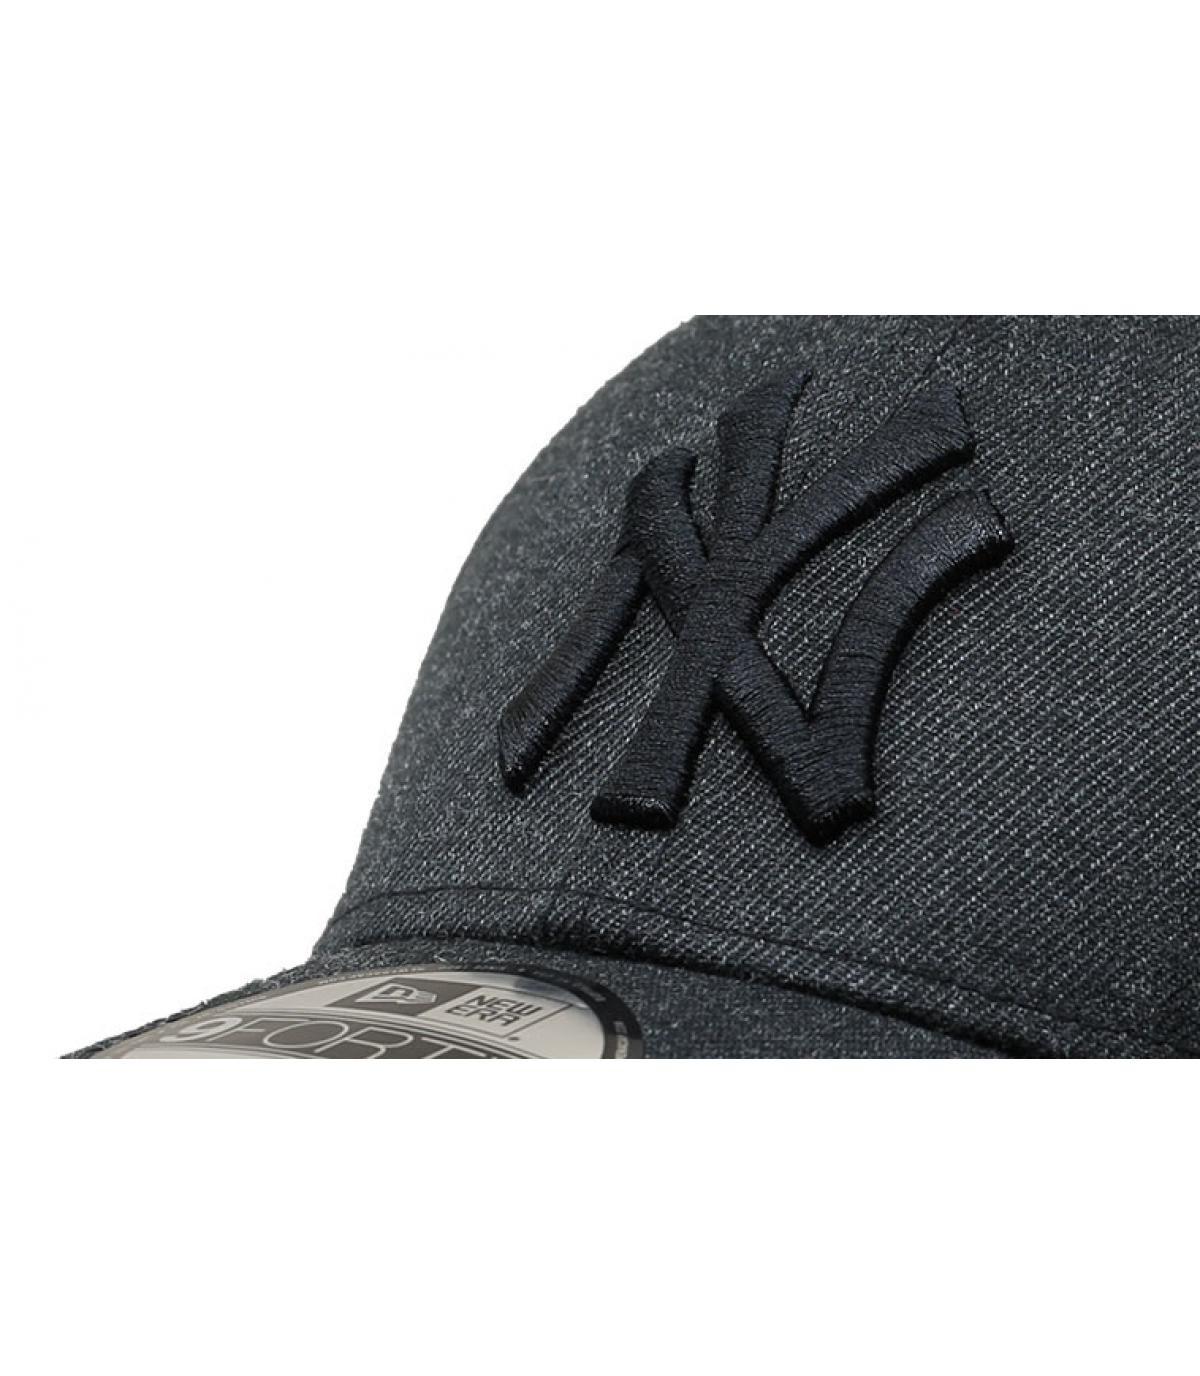 Dettagli Winterized The League NY 940 black - image 3